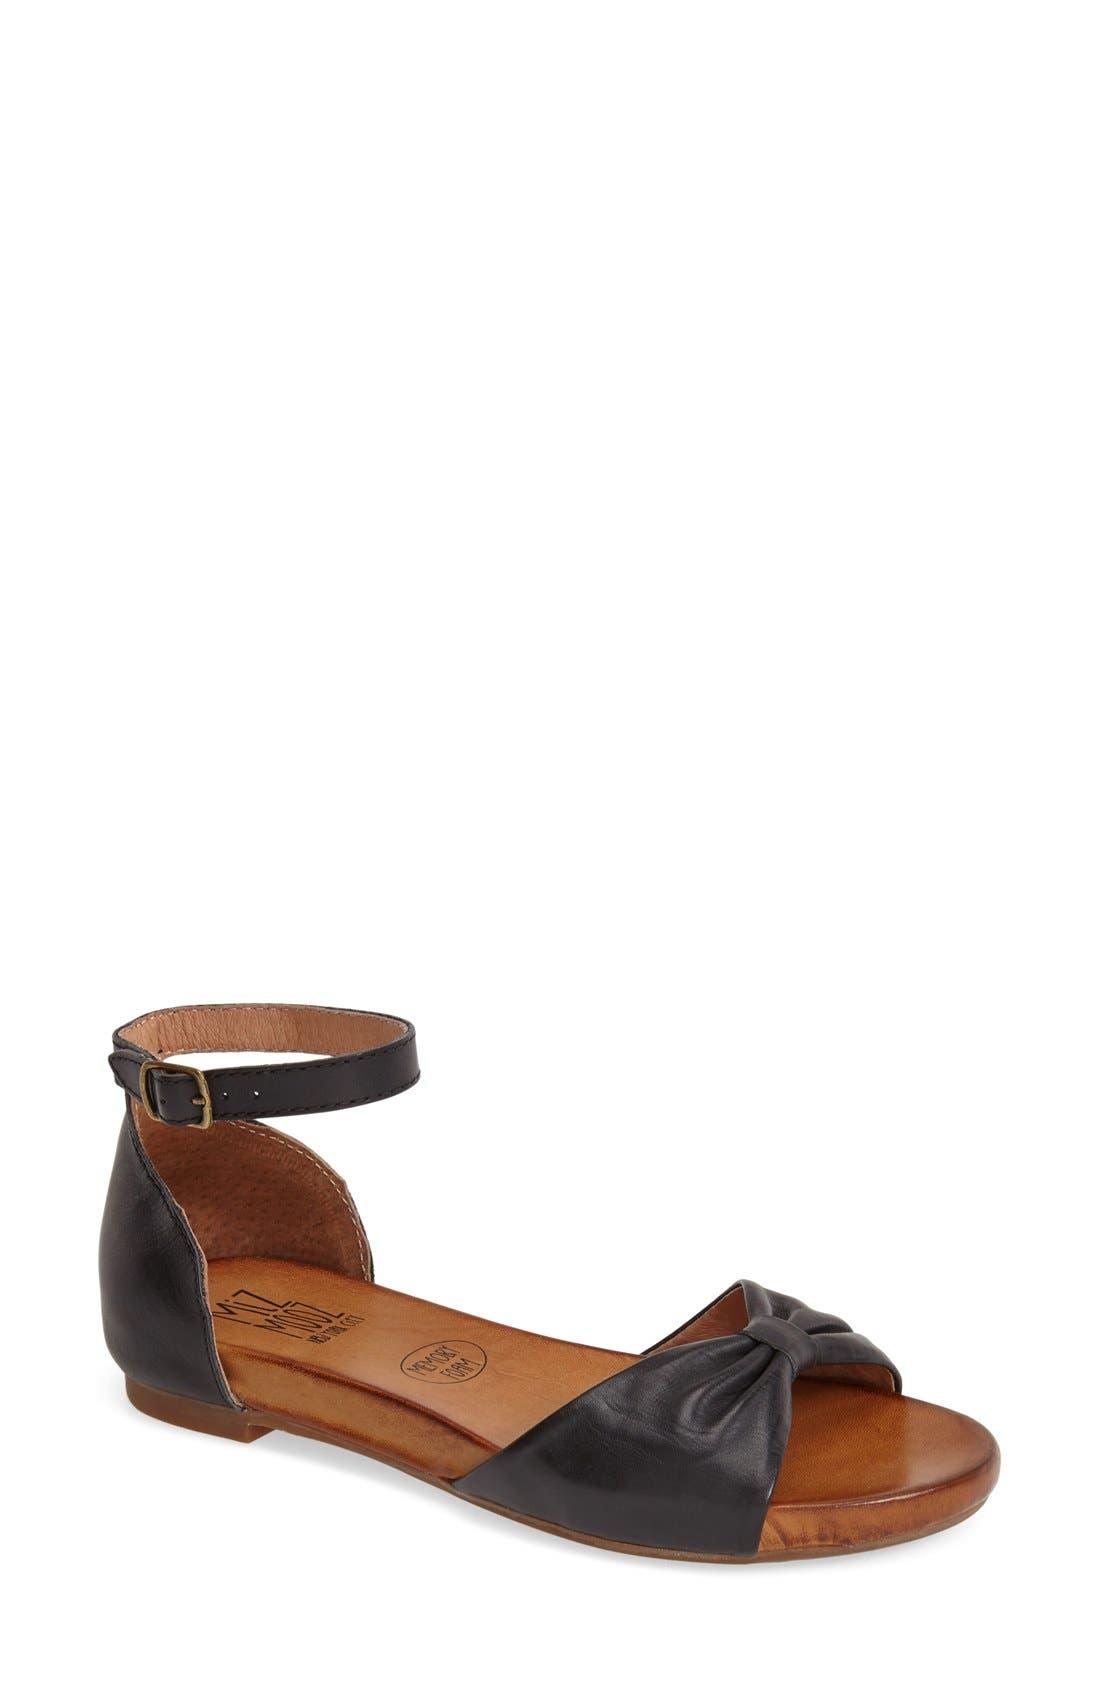 Main Image - Miz Mooz 'Arlene' Ankle Strap Sandal (Women)